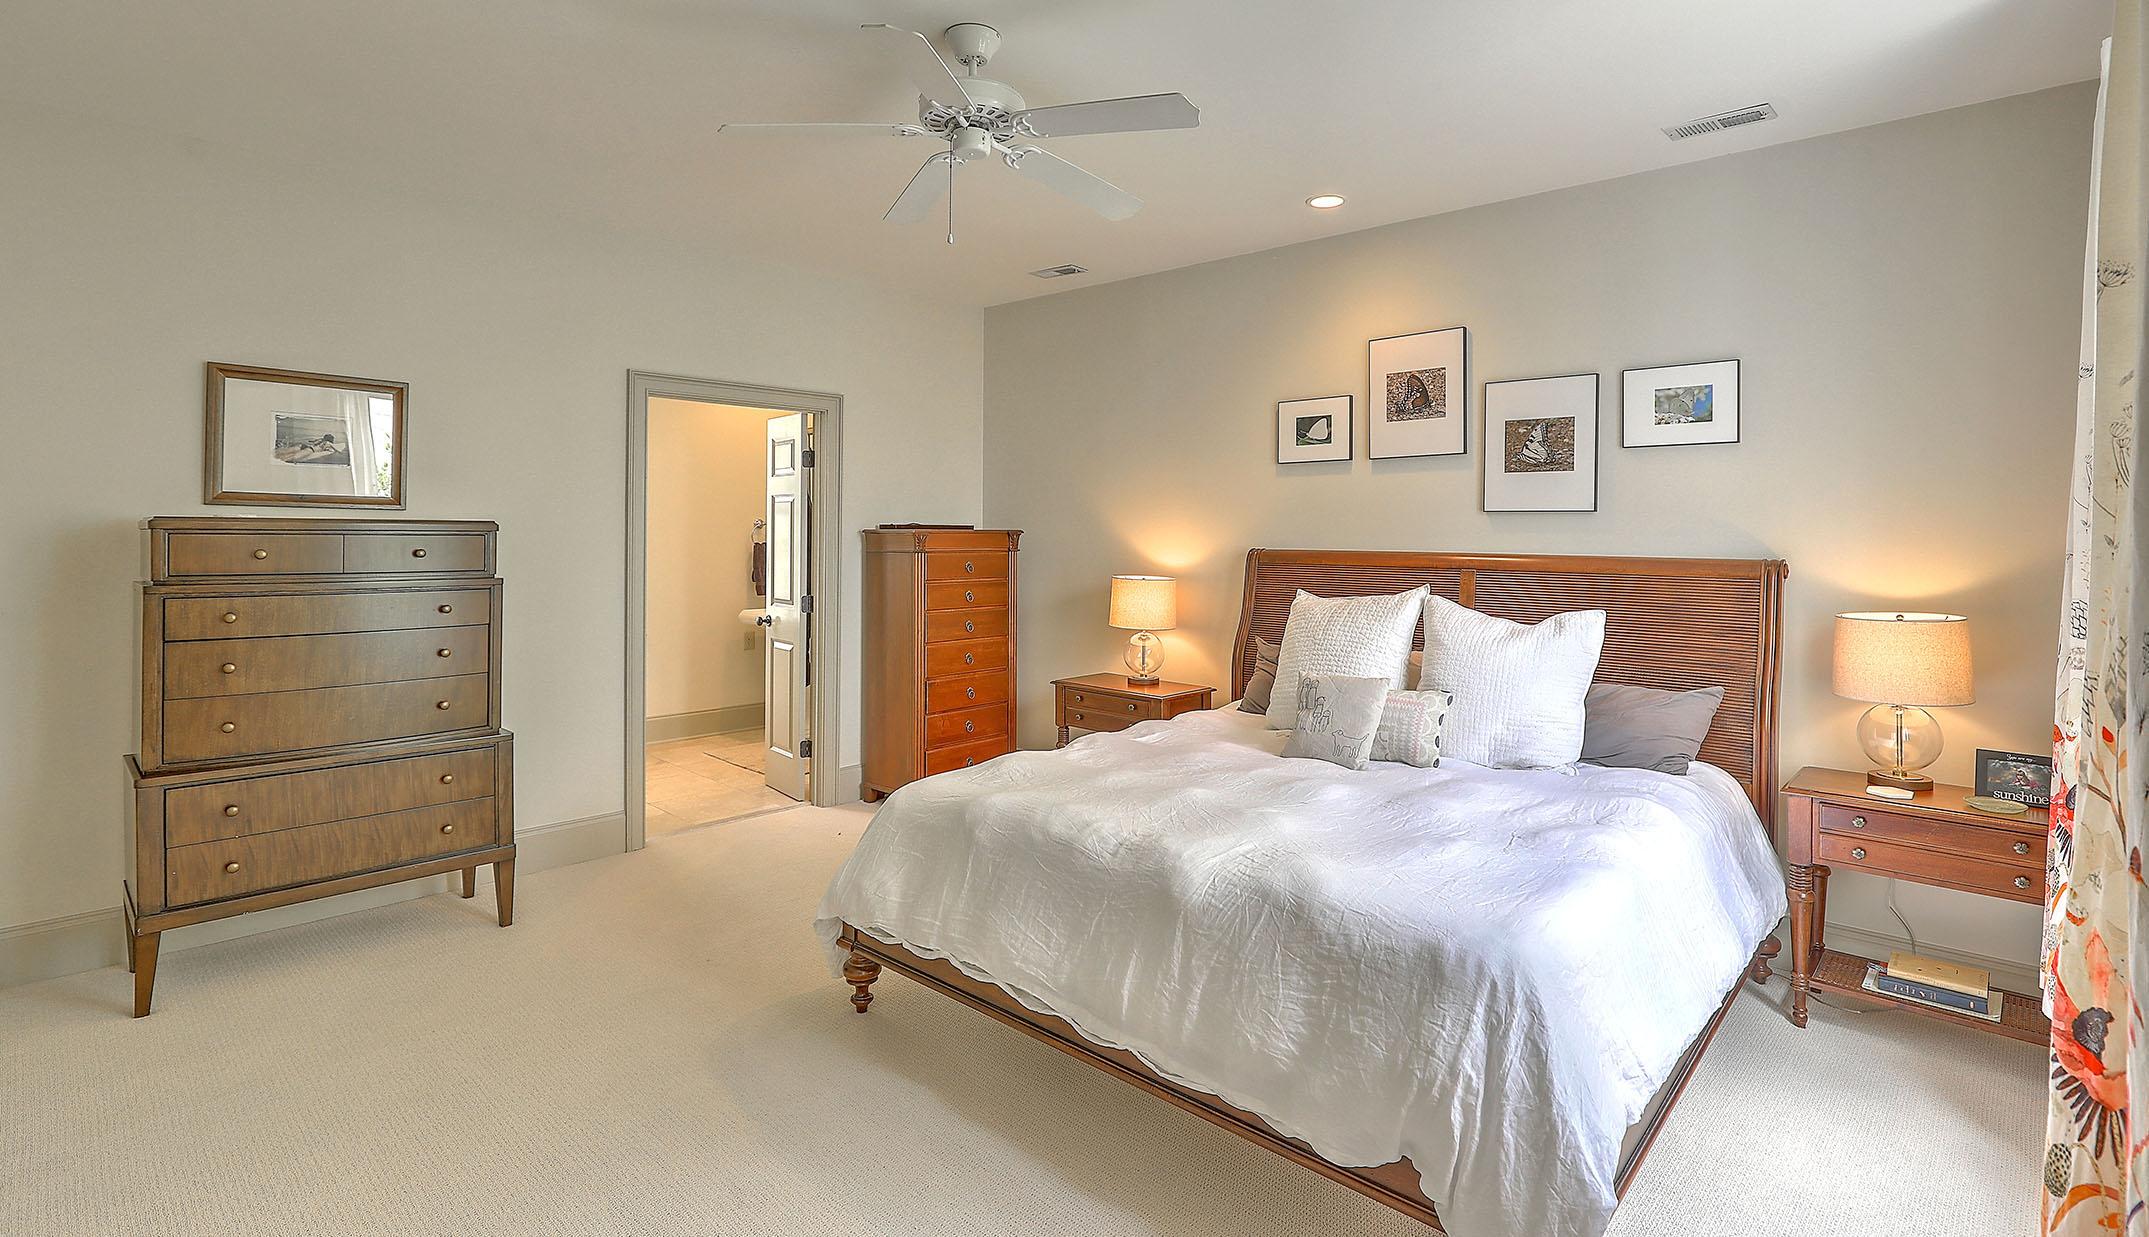 23 Felix Street master bedroom